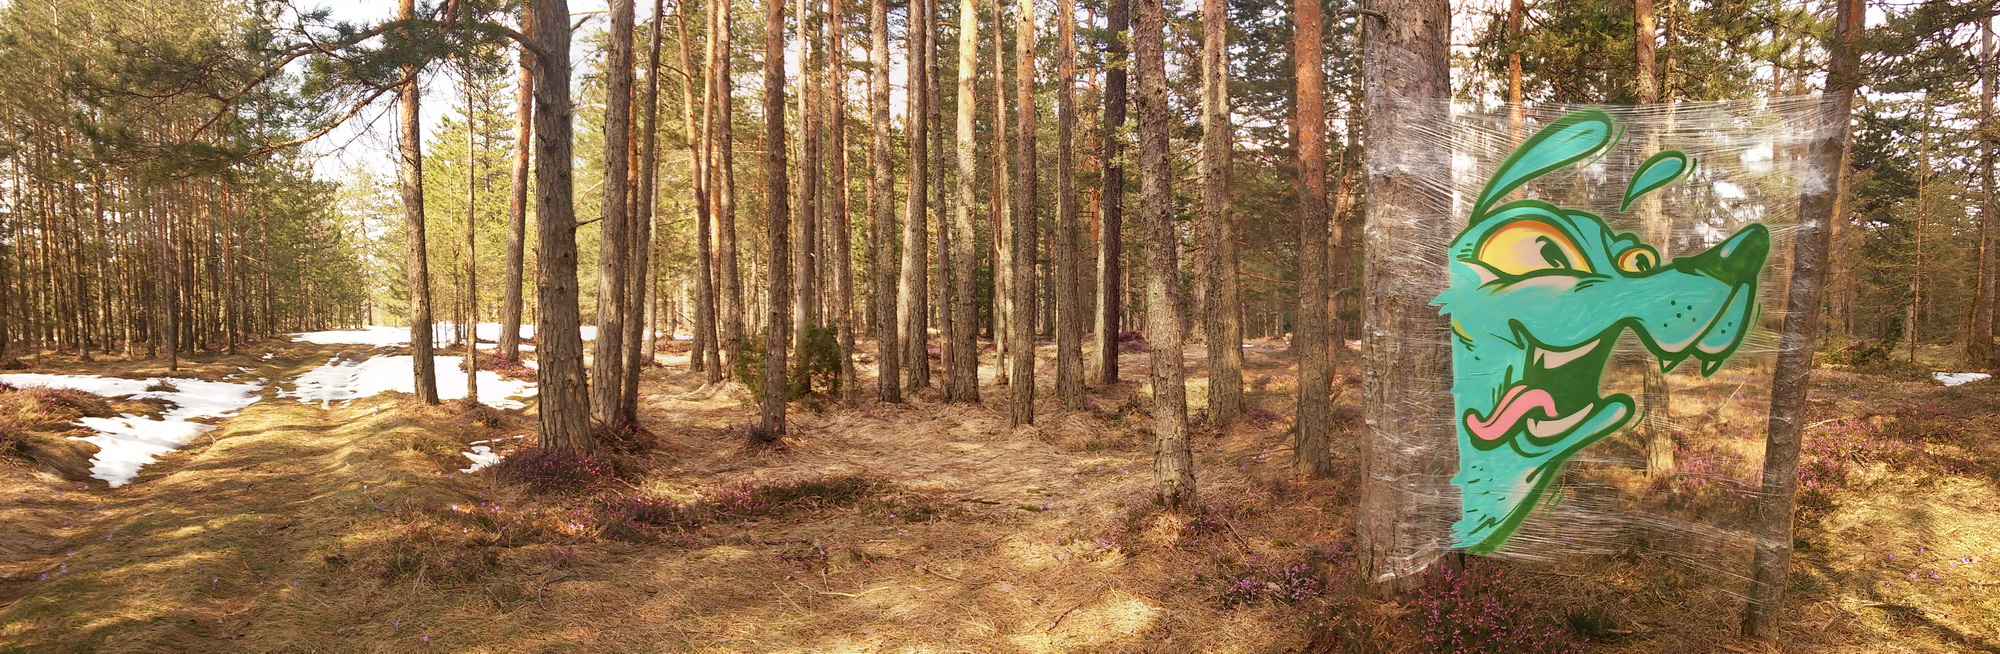 Junk cellograff panorama